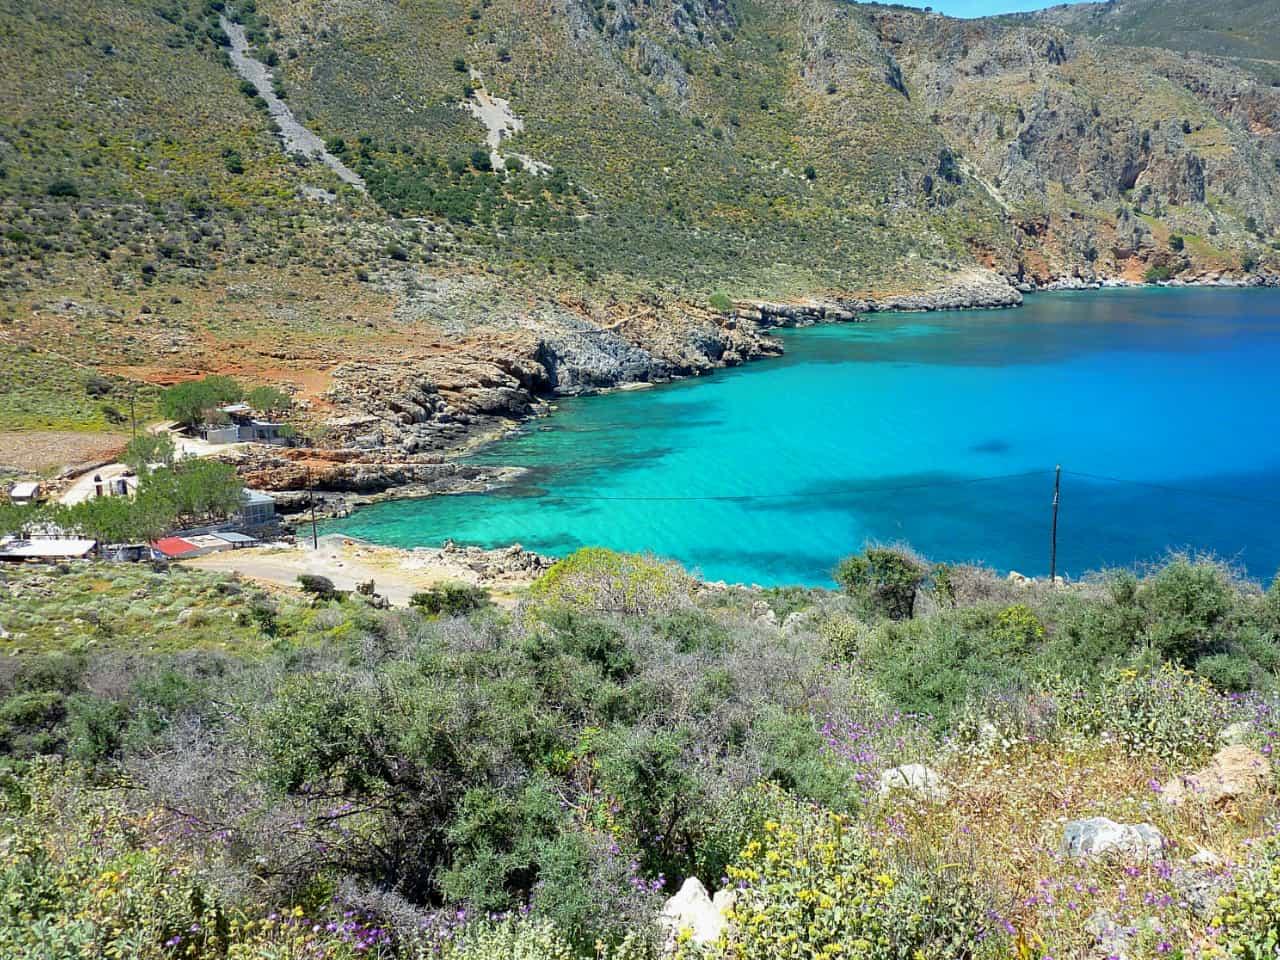 ombrosgialos beach chania, Art Retreats in Gavalochori Village, Chania, Crete, artful retreat chania crete, bleverde villas penelope orfanoudaki artist, best art retreat crete